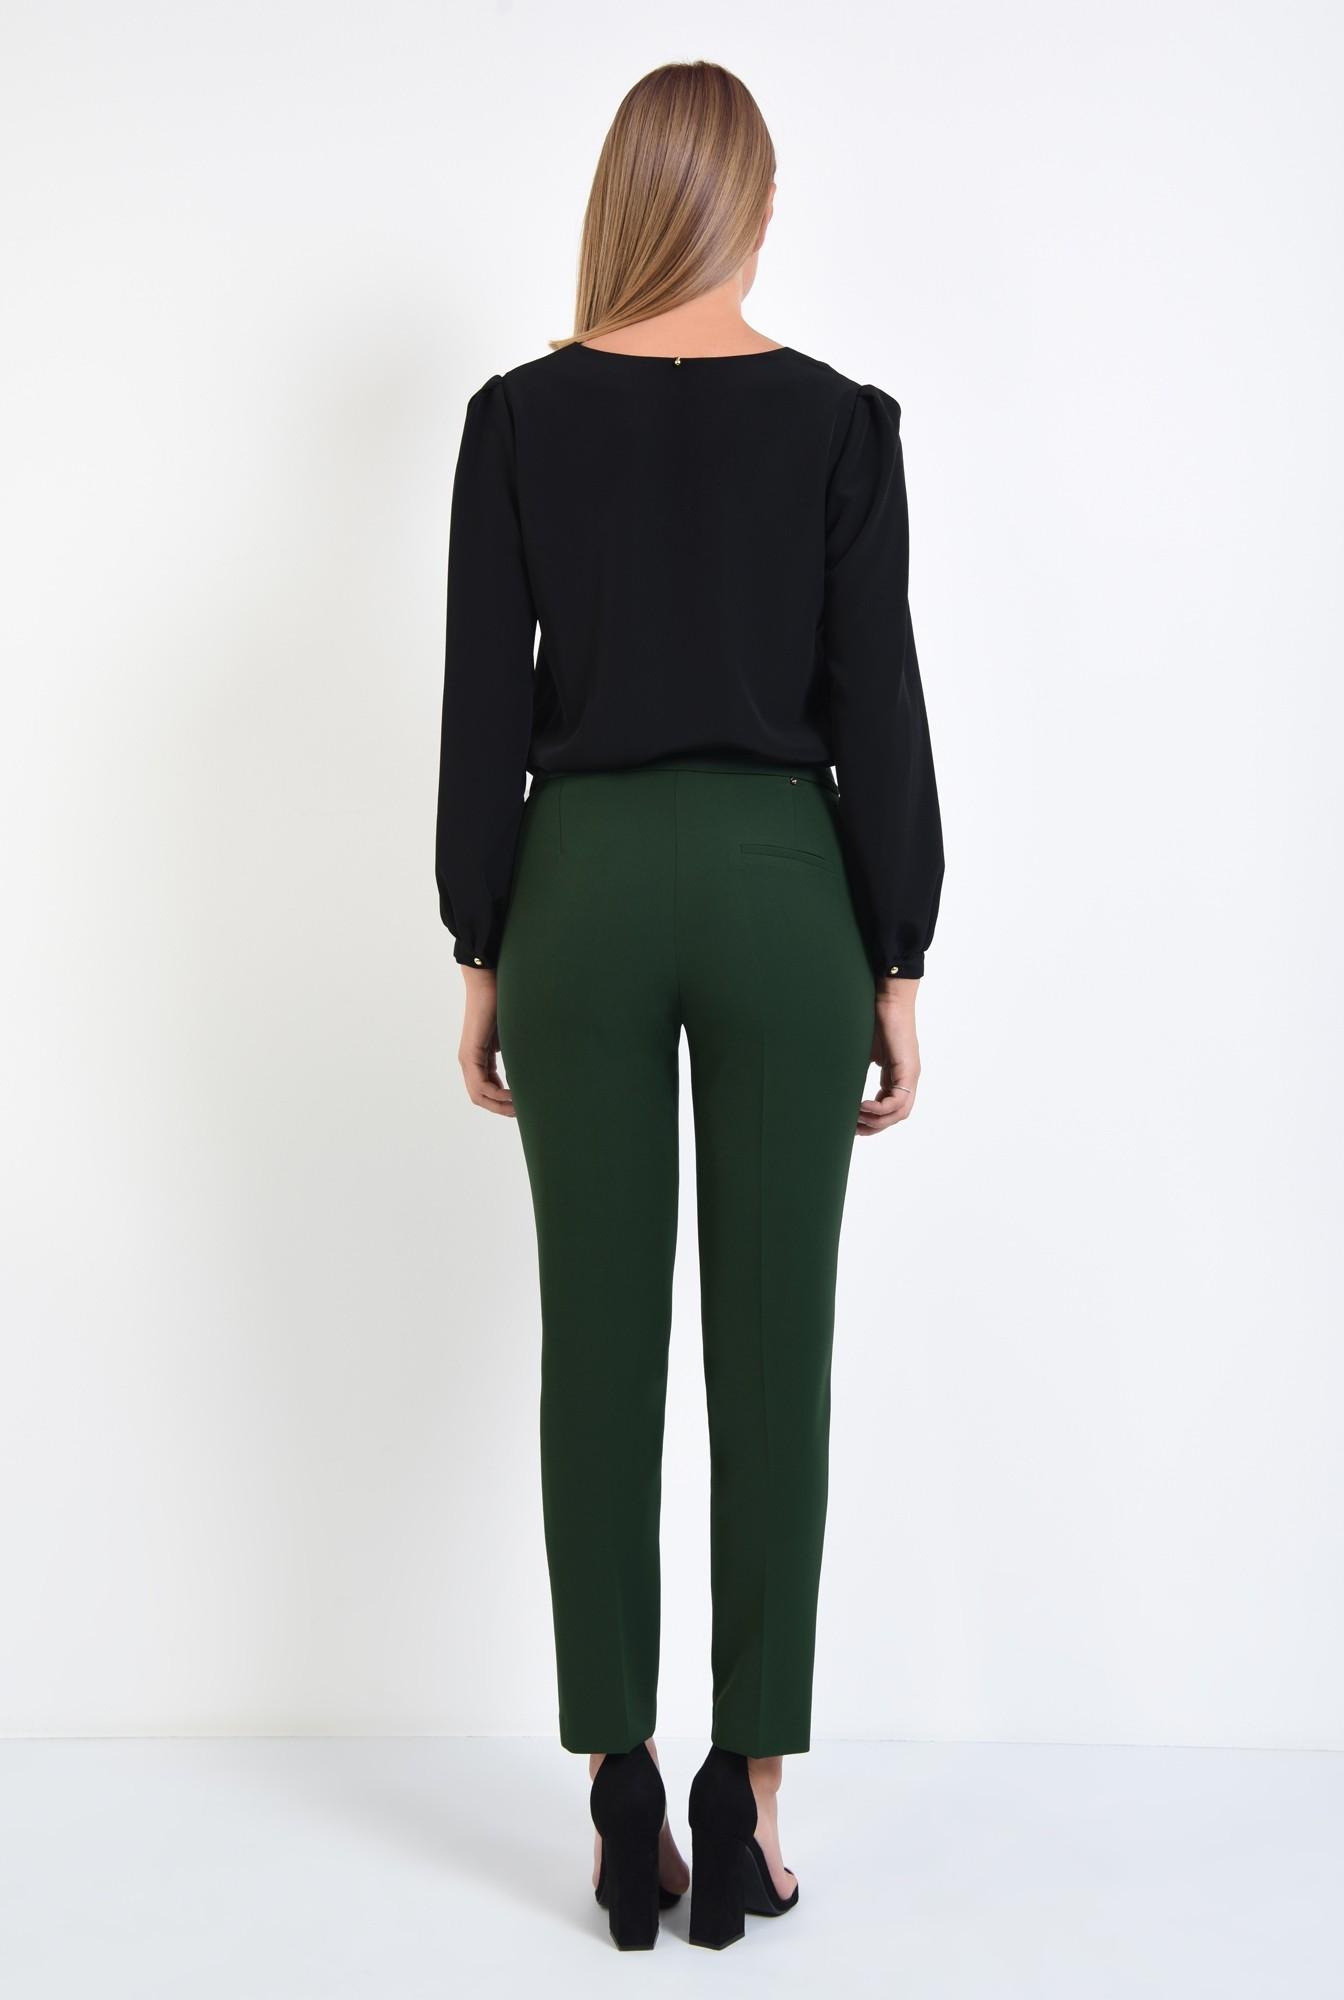 1 - pantaloni casual, verde, croi conic, talie medie